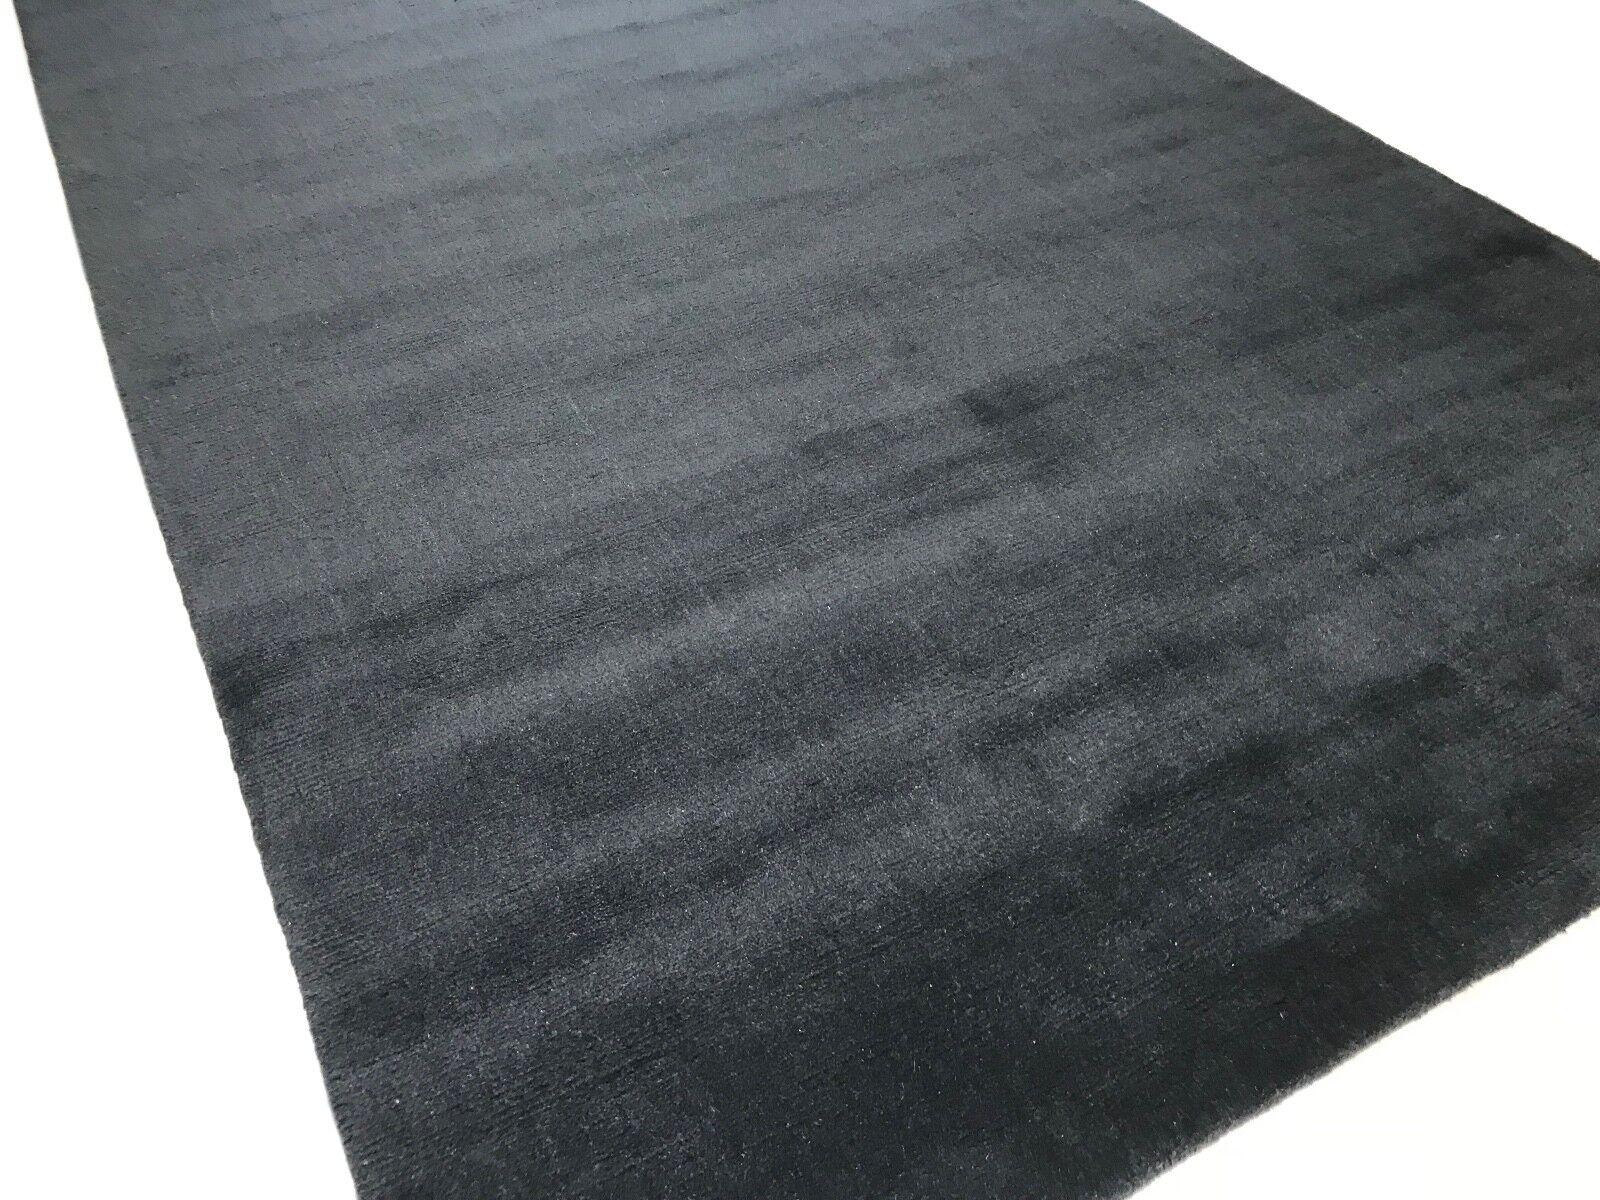 Handloom Gabbeh 200x300 cm a mano tessuti moquette 100% LANA debbich Loom BLU SCURO